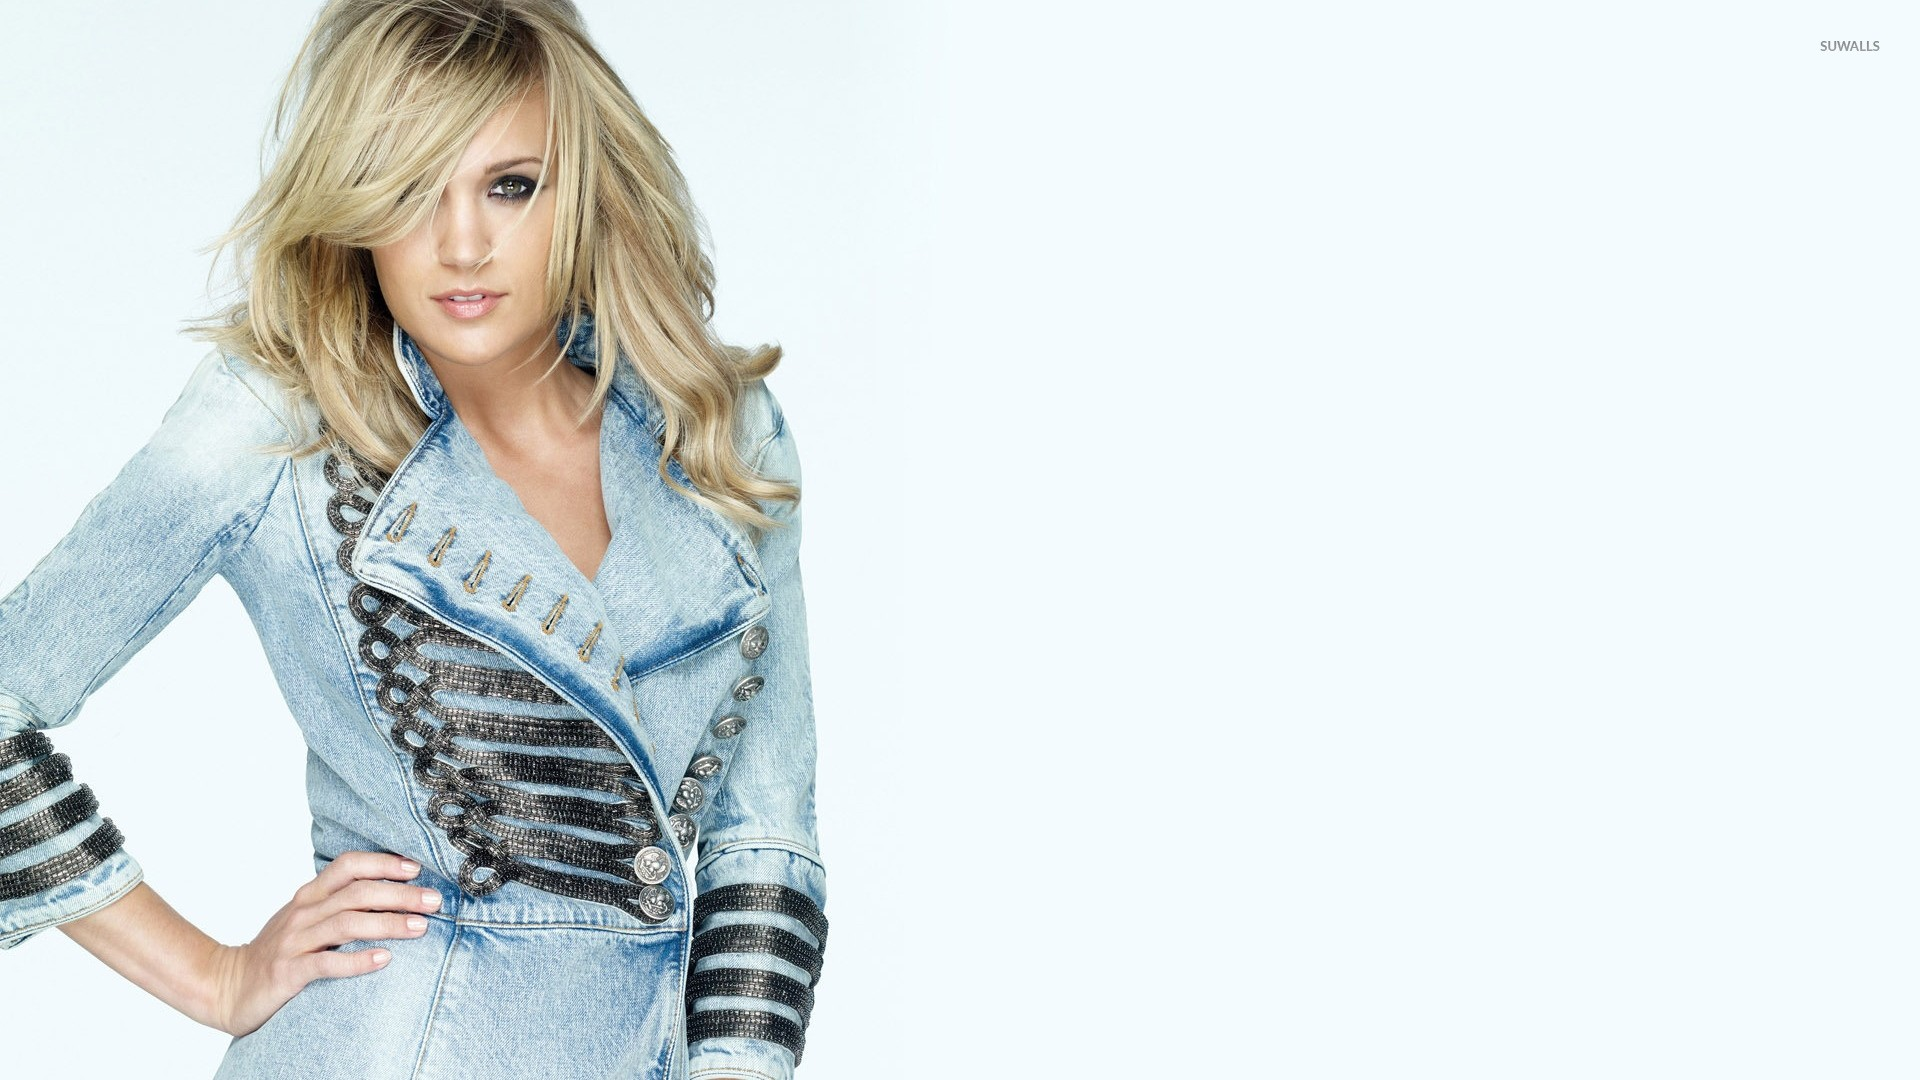 Carrie Underwood pc wallpaper